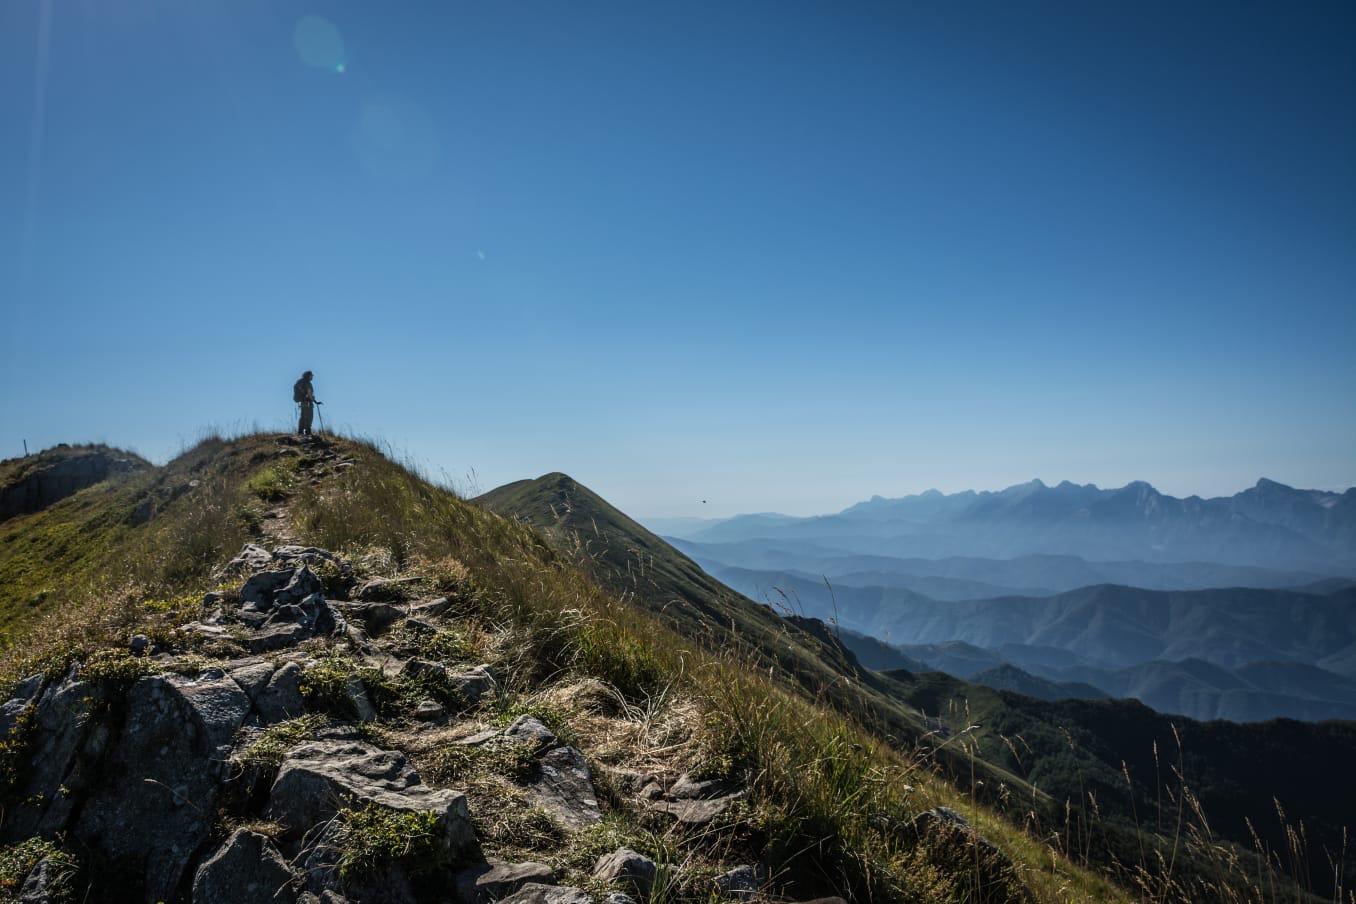 Trekking in the Appennino Tosco-Emiliano National Park